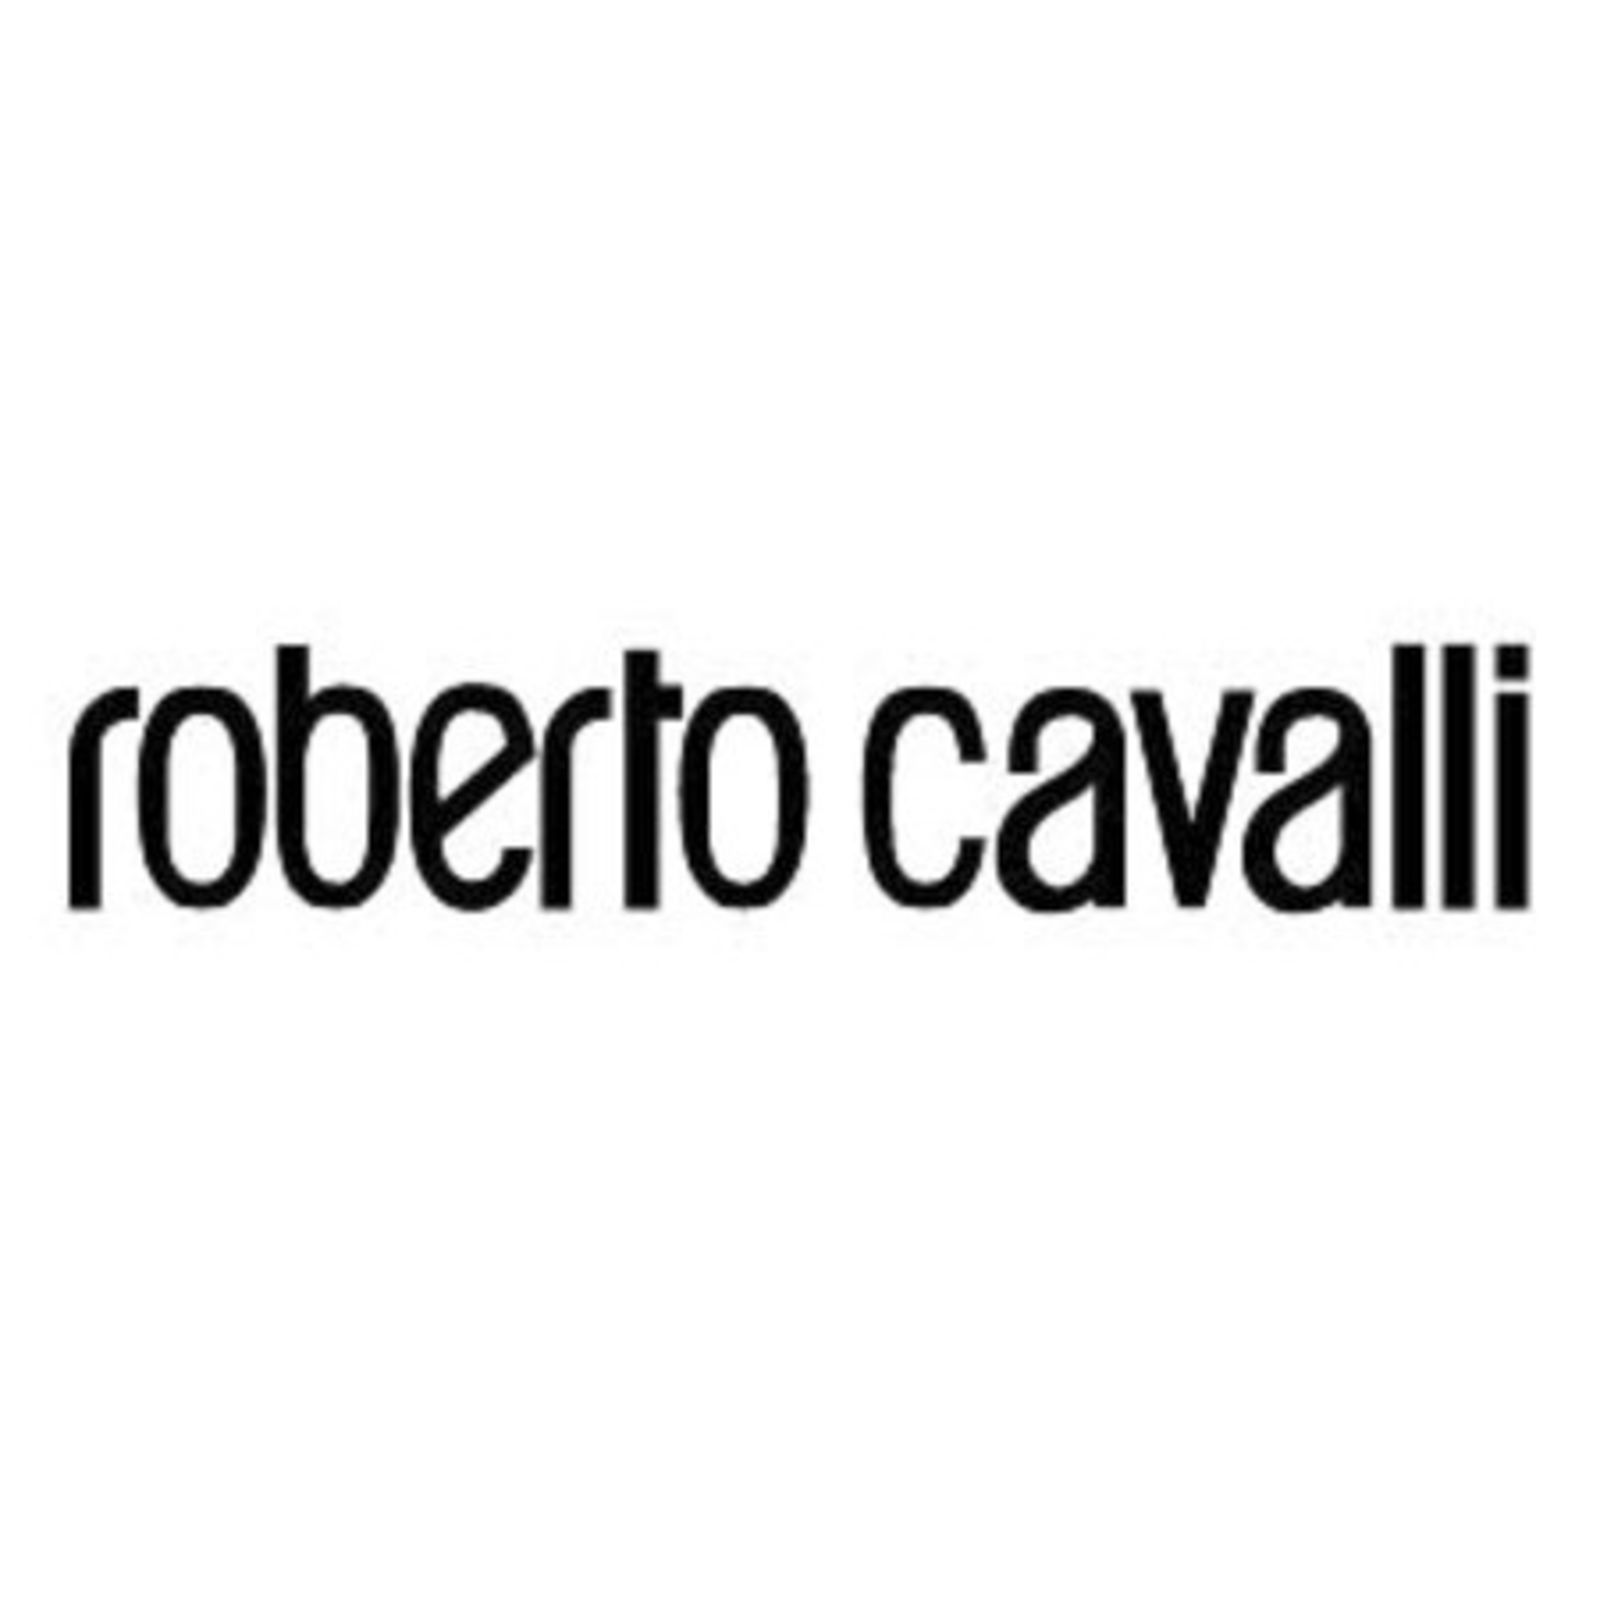 Roberto Cavalli (Bild 1)